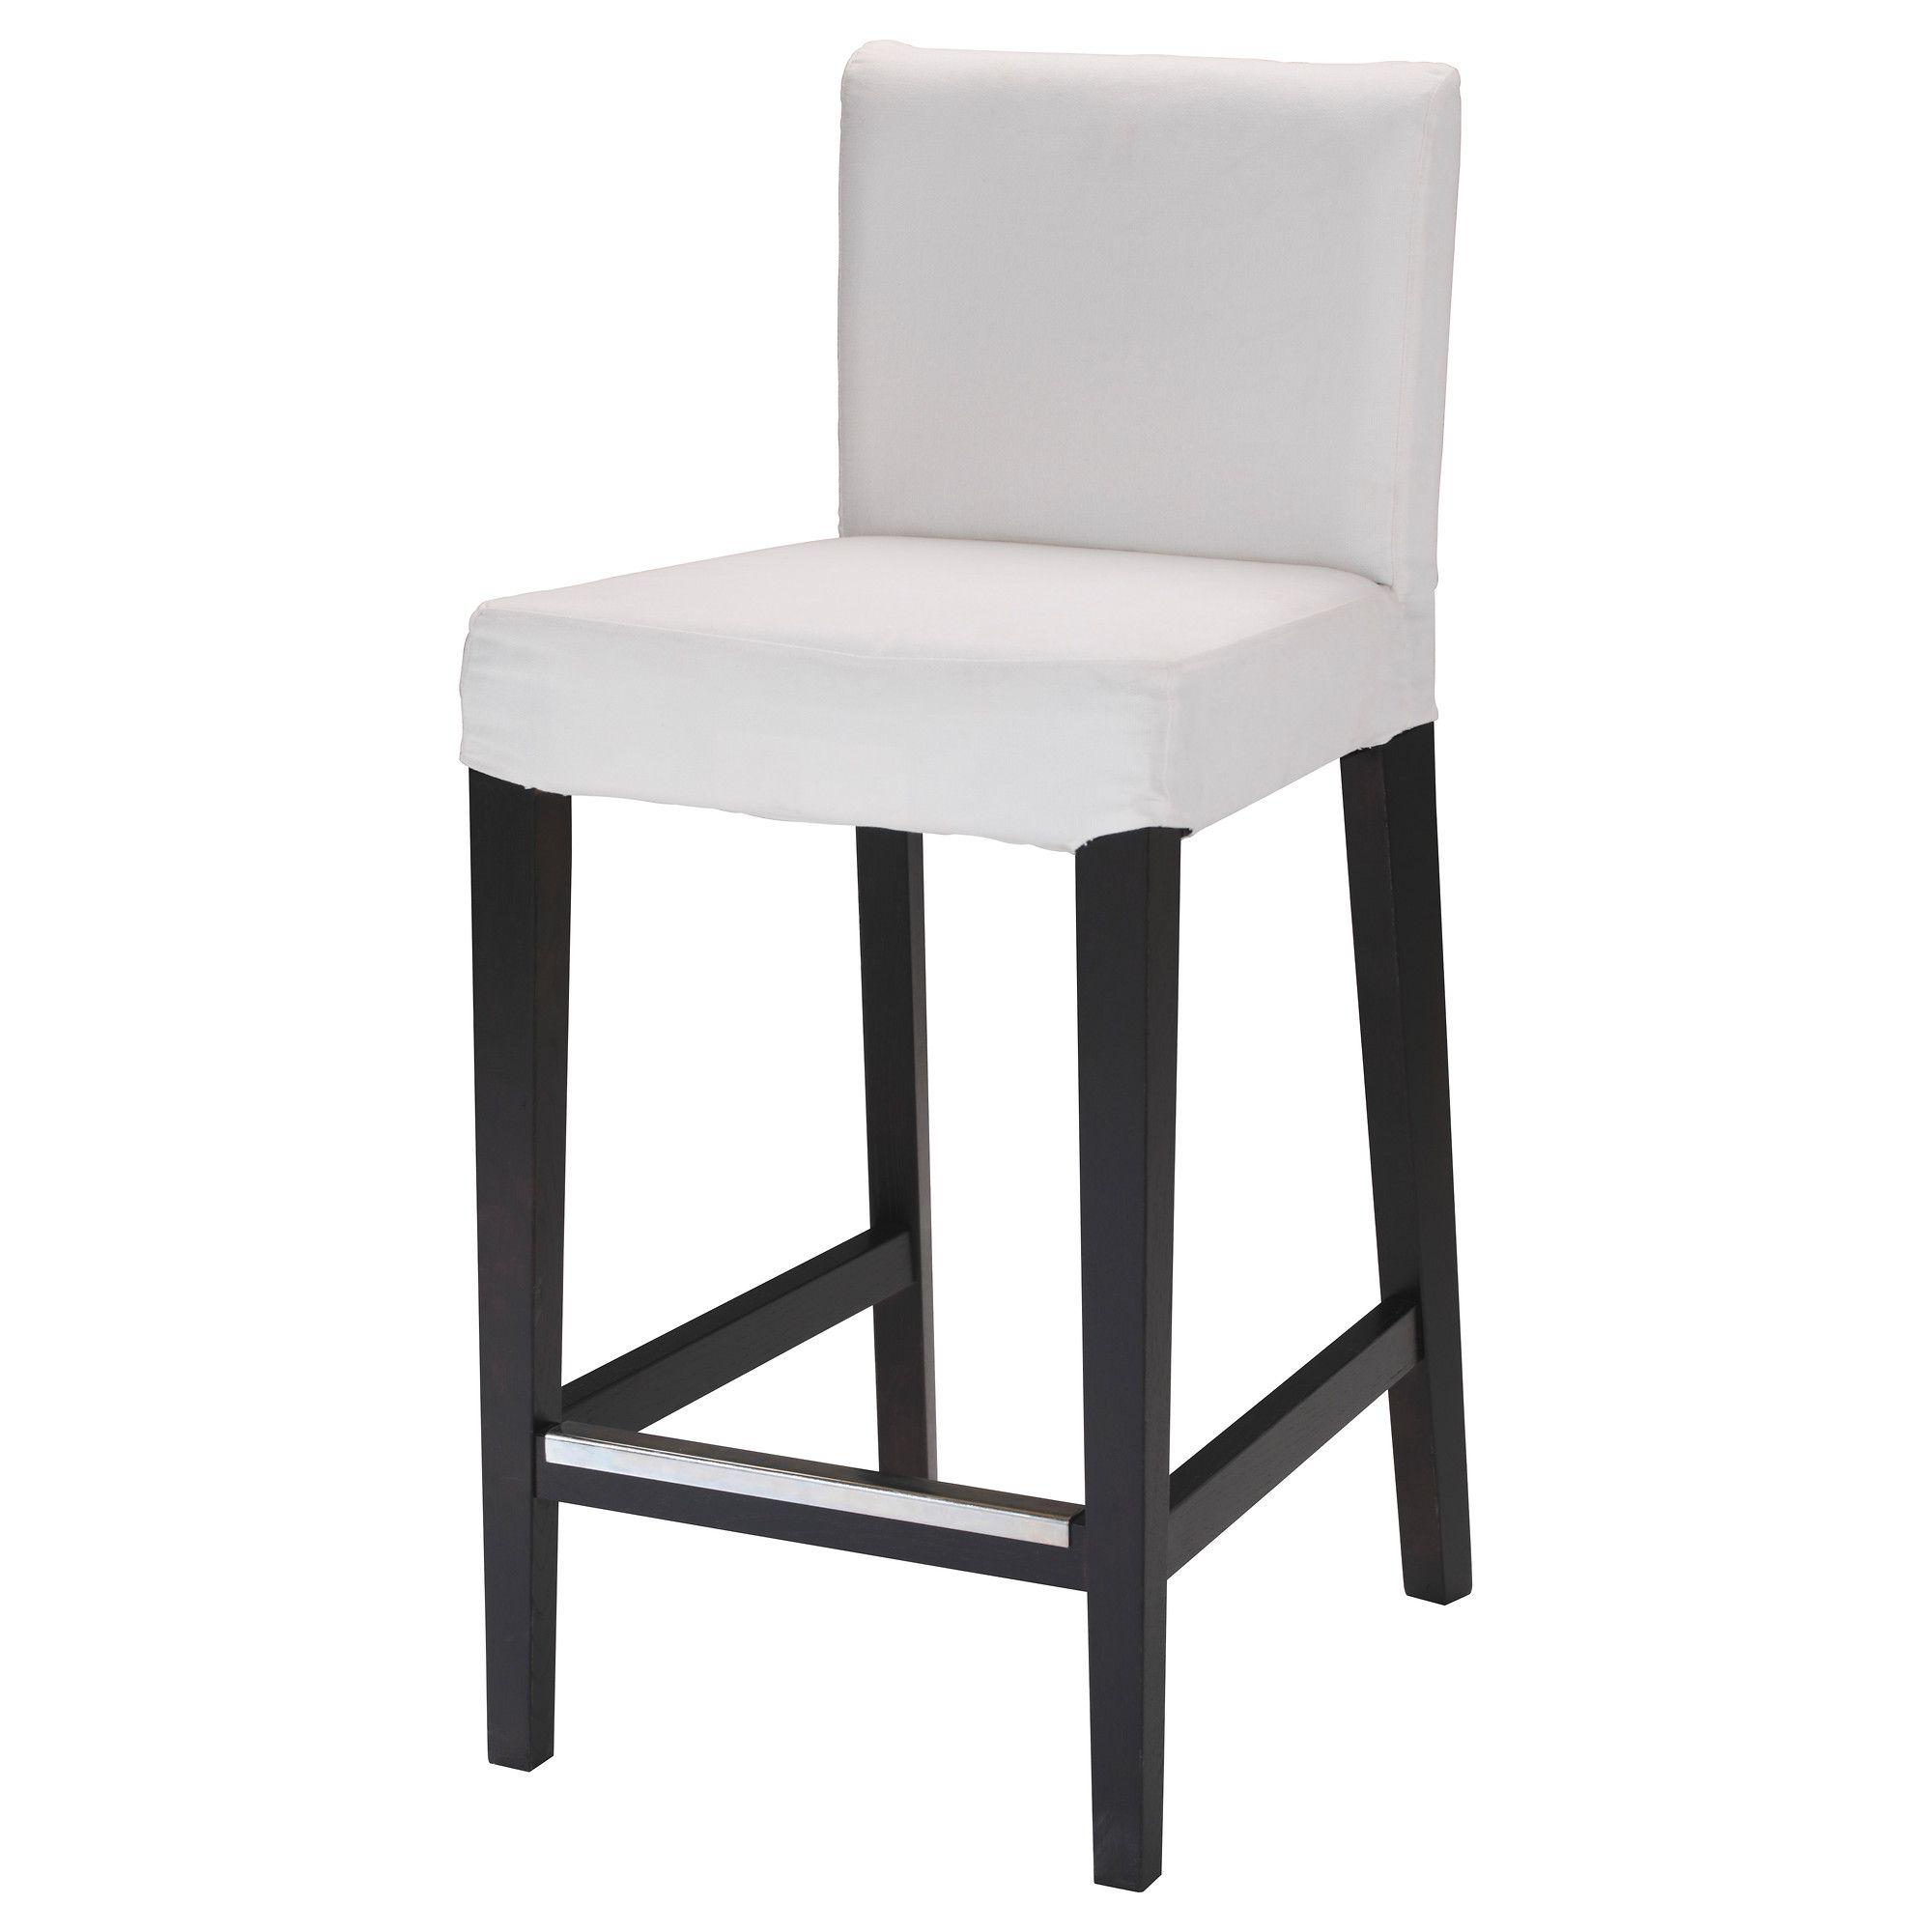 stool bar - Búsqueda de Google | BANQUETAS ALTAS | Pinterest ...